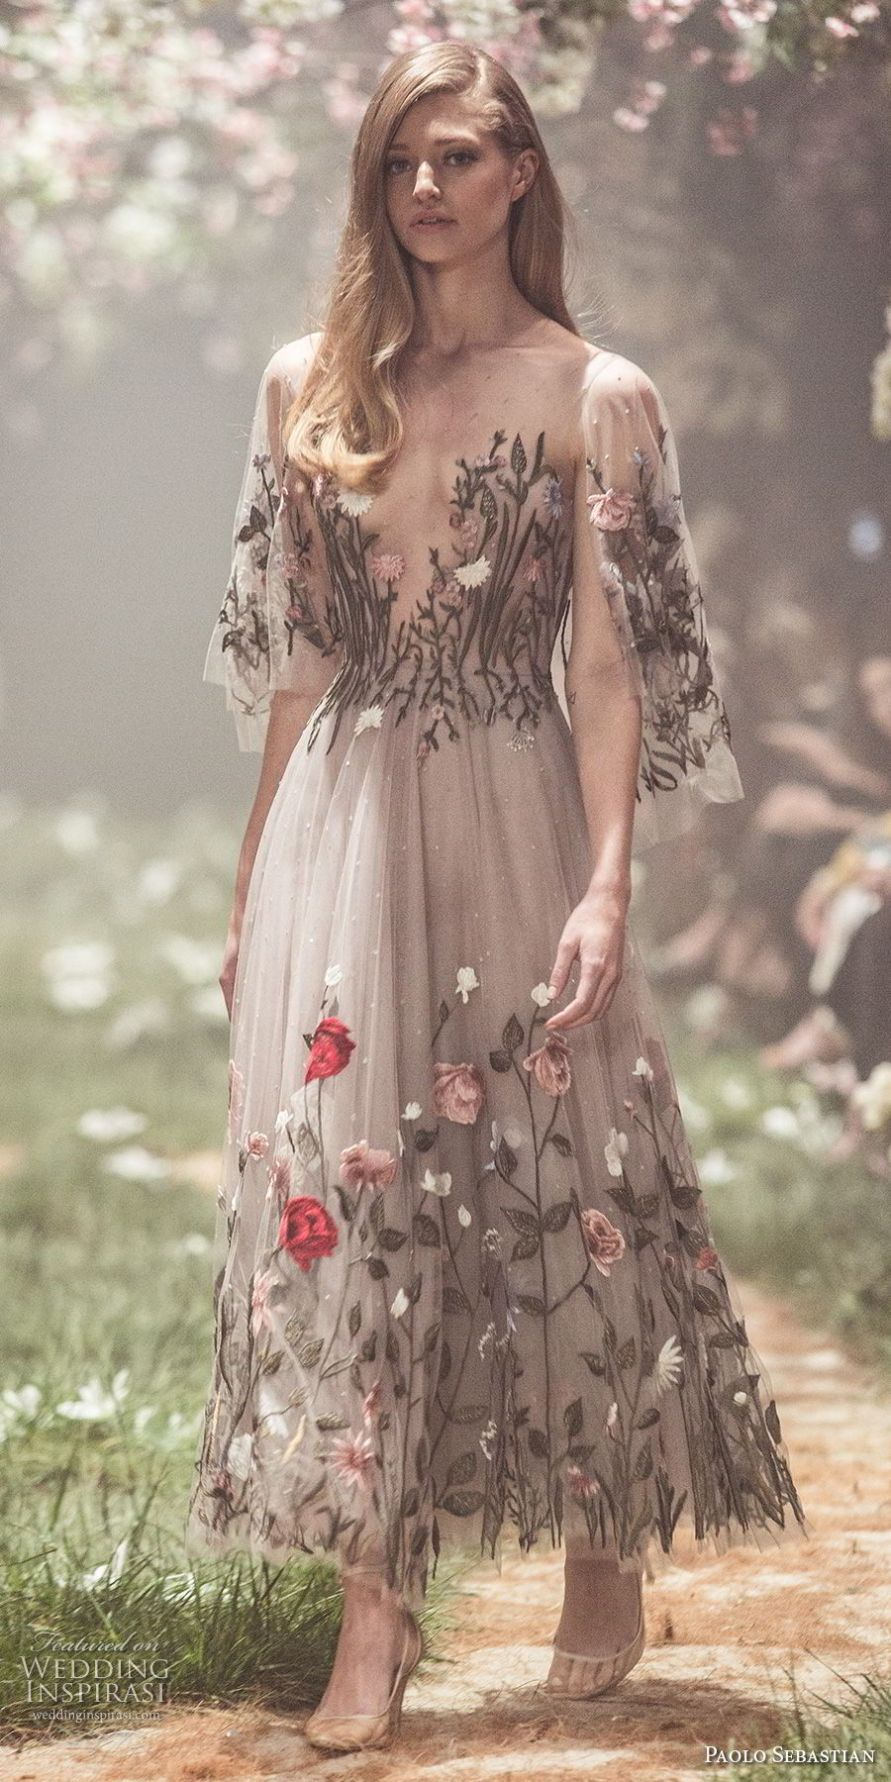 Paolo Sebastian Frühling 2018 Couture Brautkleider   – 1807